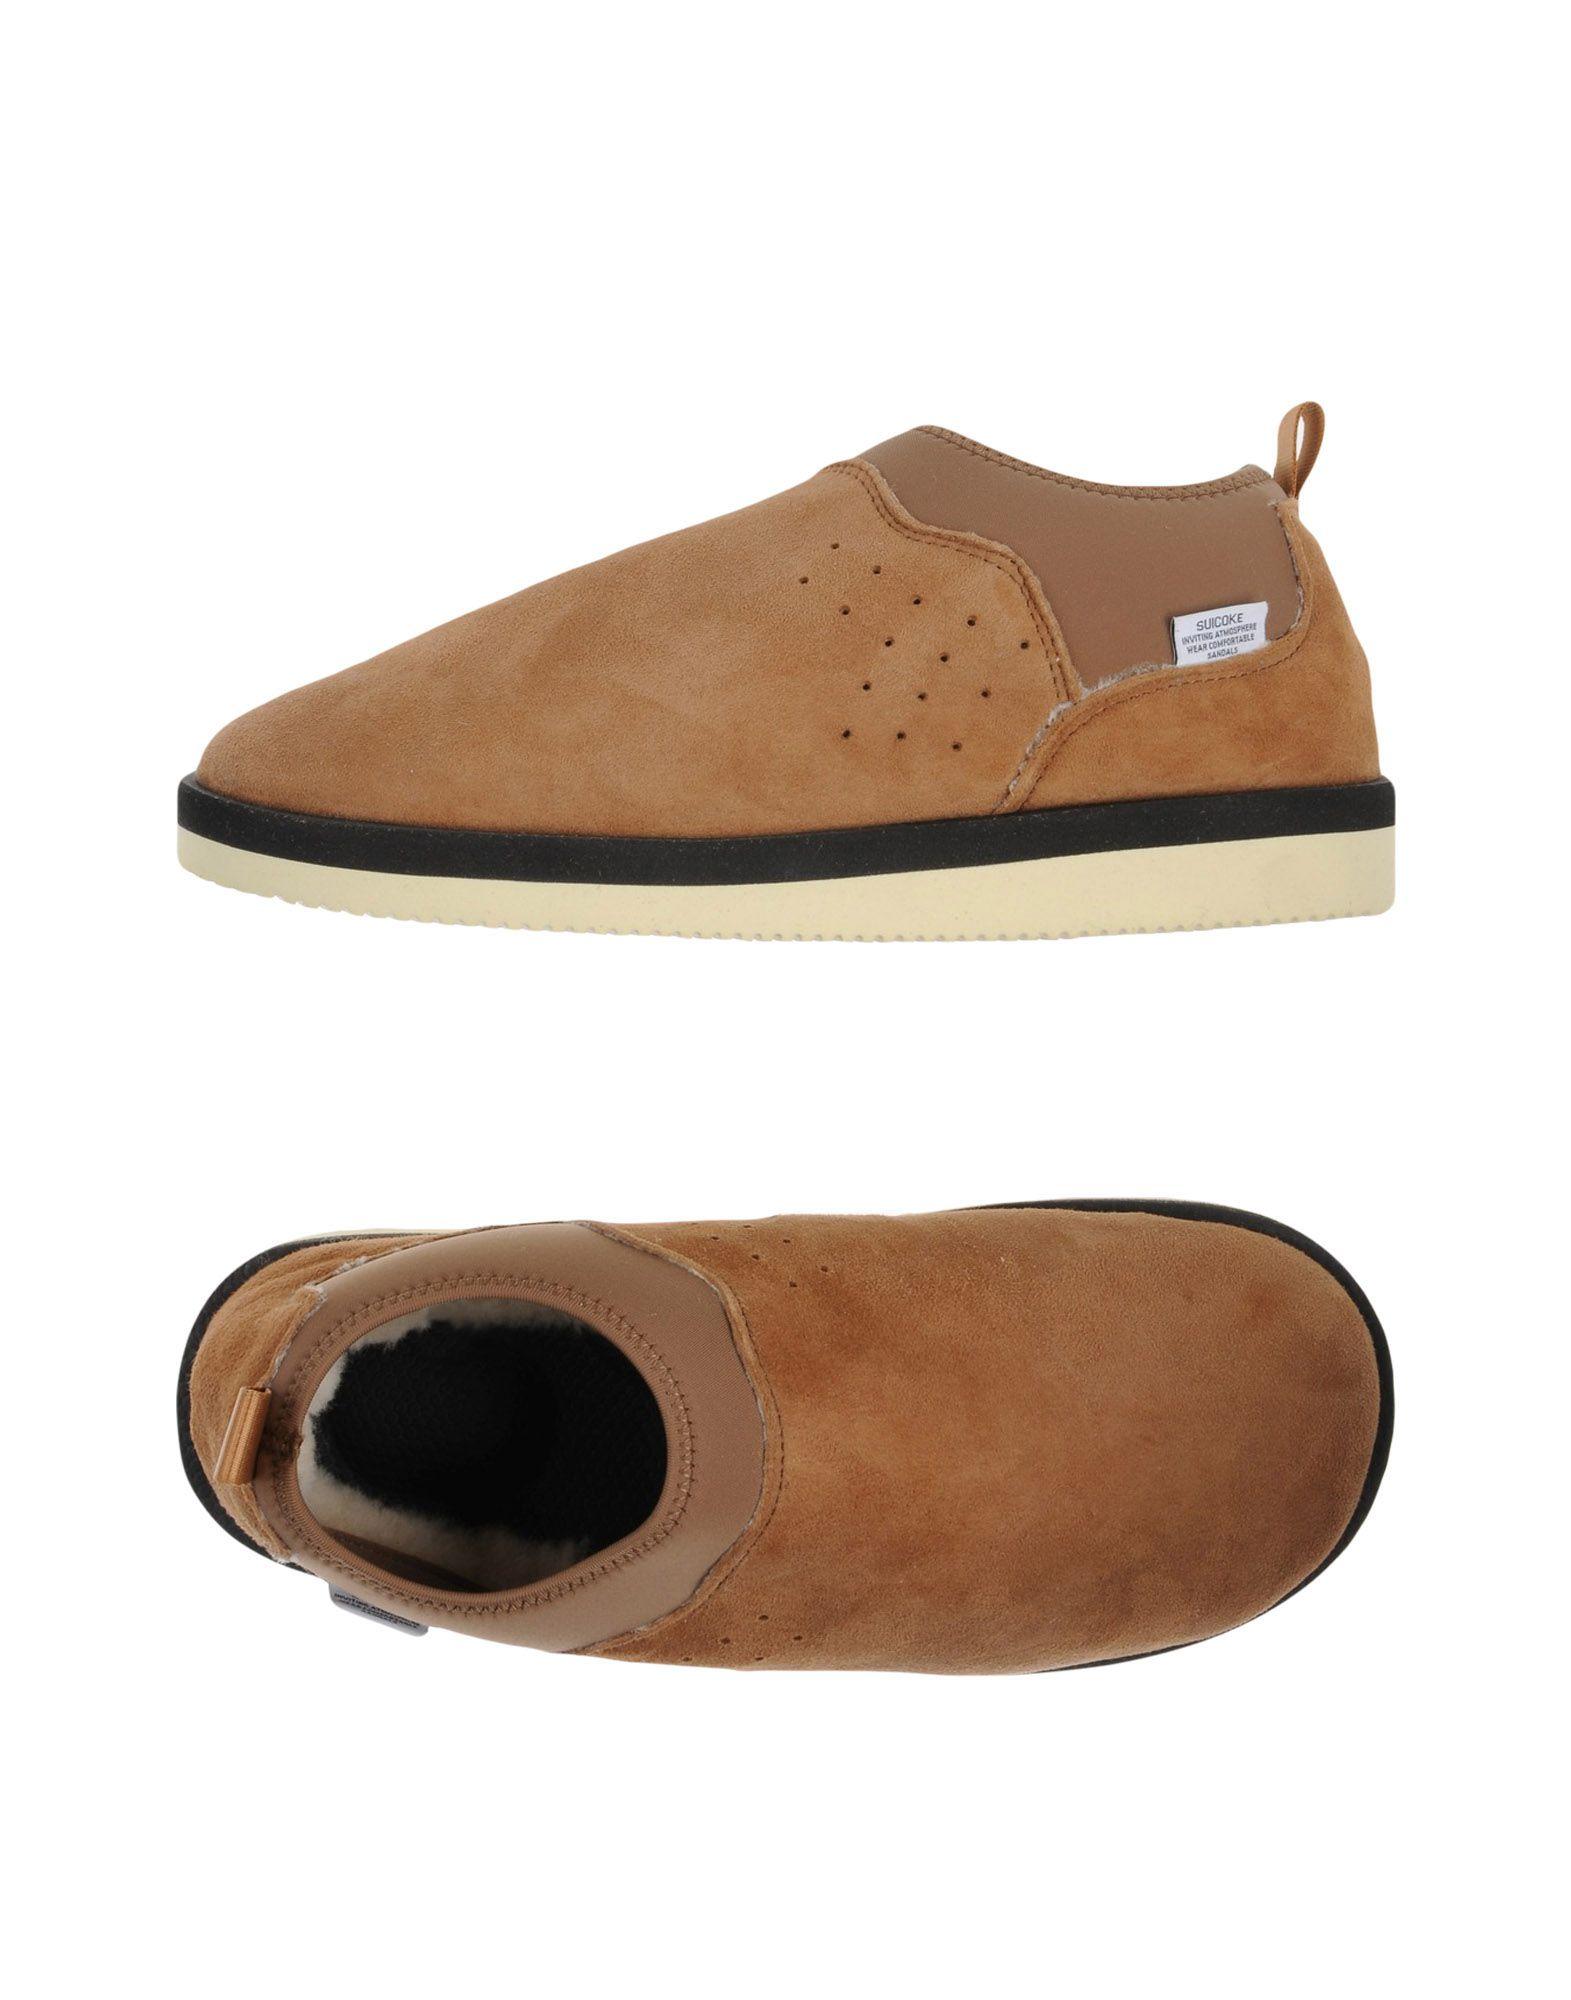 Sneakers Suicoke Uomo - Acquista online su